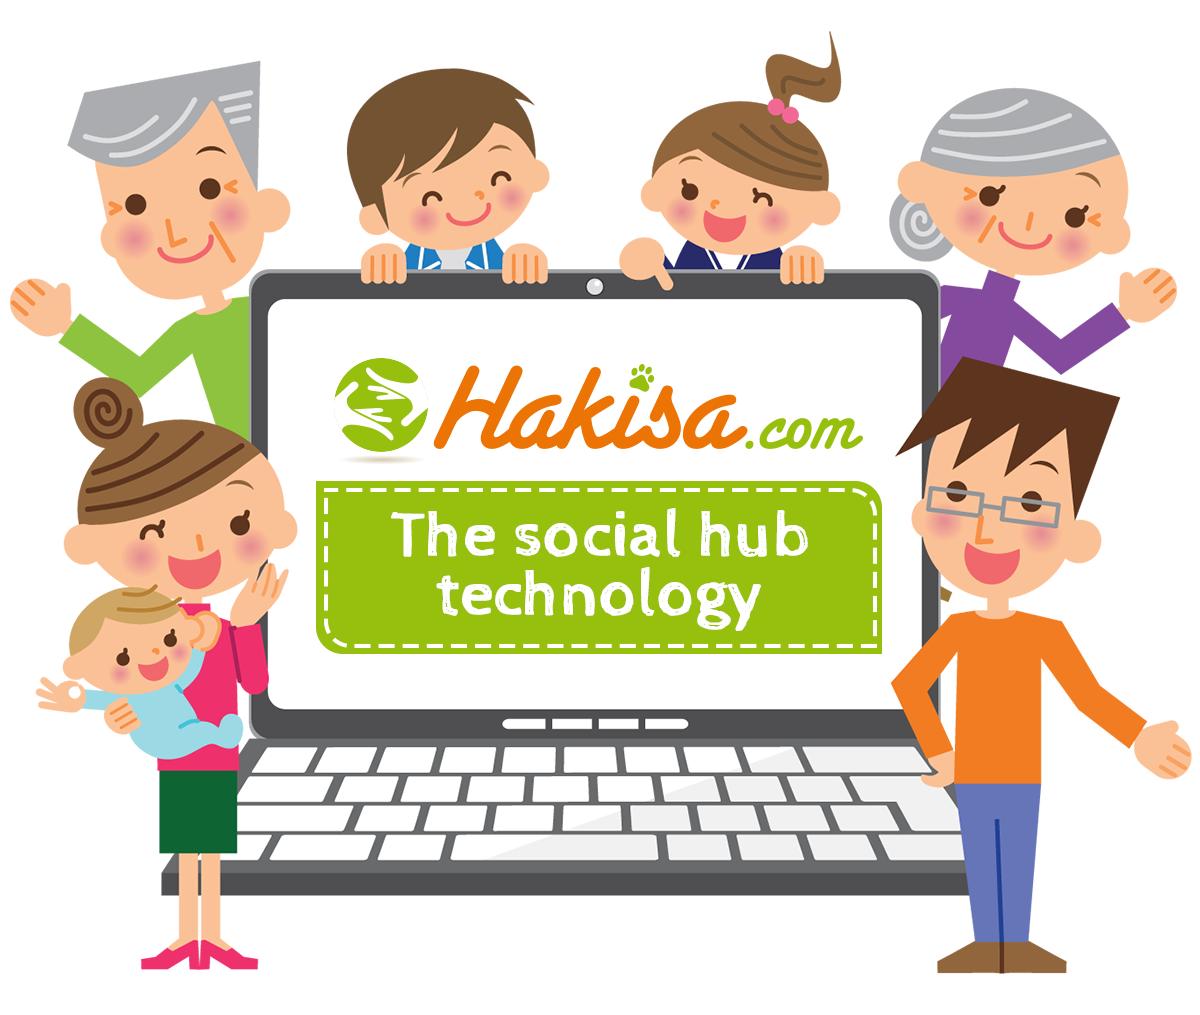 hakisa-social-hub-famille-ecran-tagline